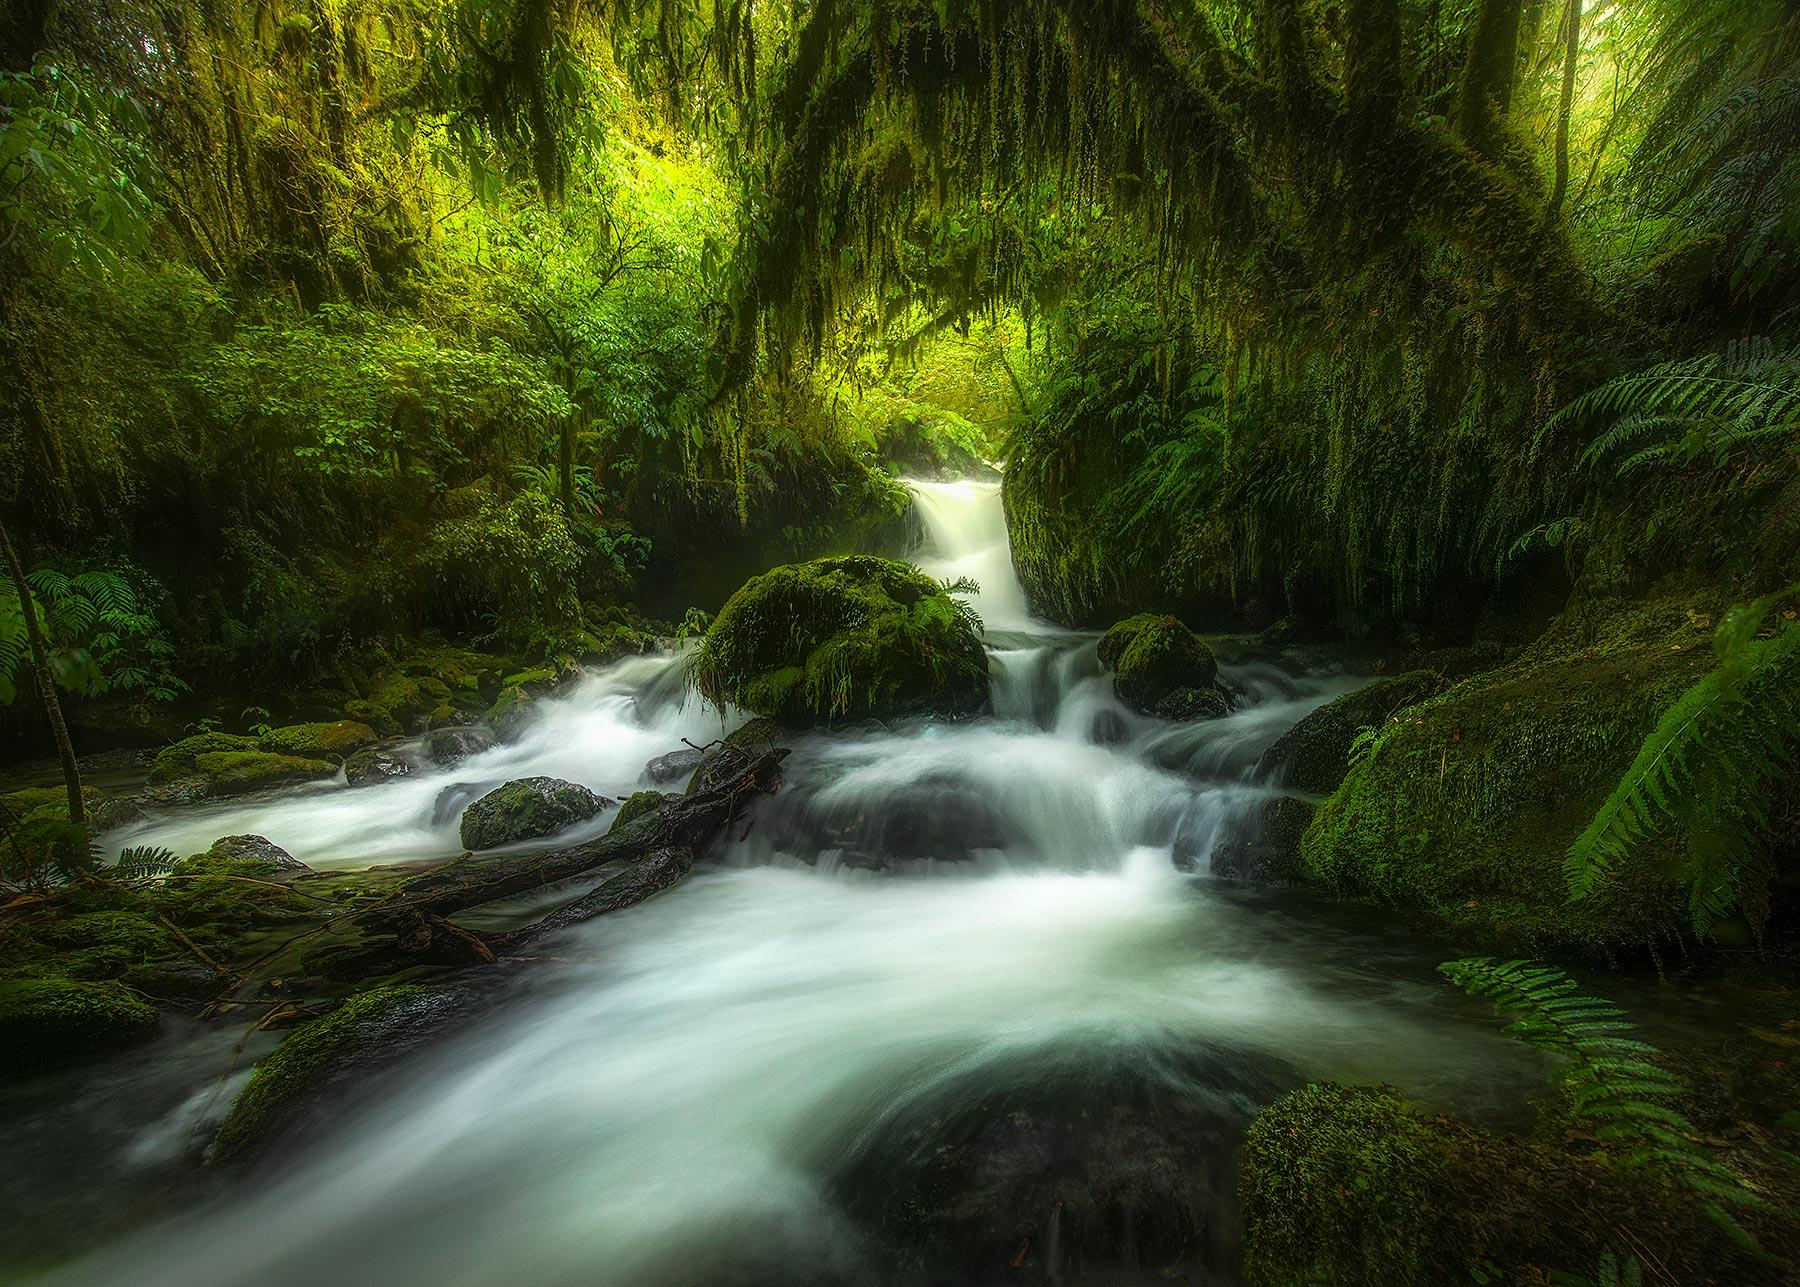 Hollyford, New Zealand, fern, forest, rainforest, stream, photo